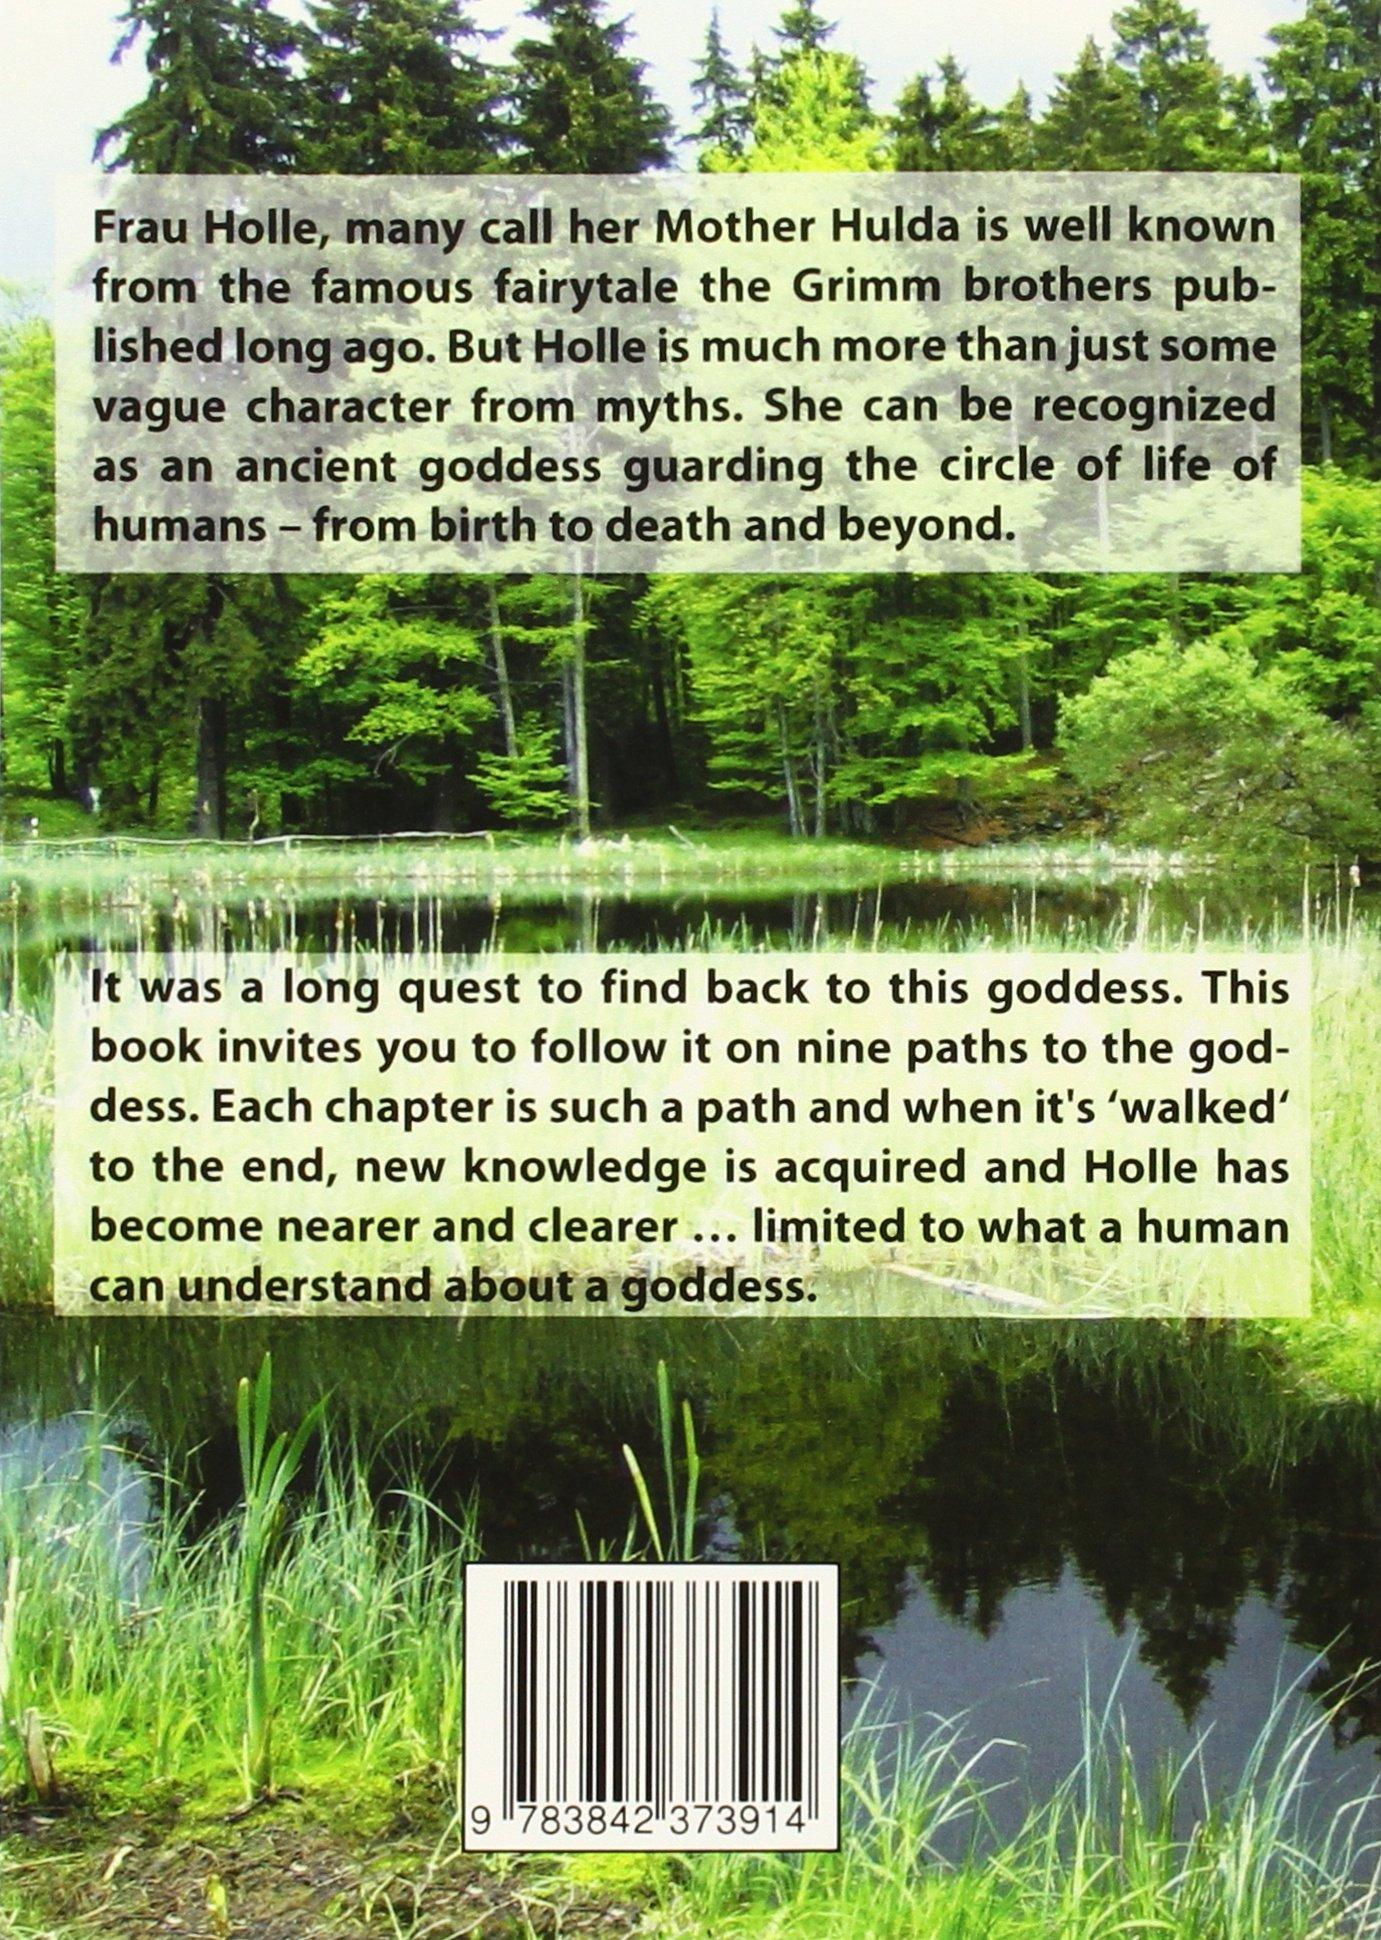 goddess holle gardenstone 9783842373914 amazoncom books